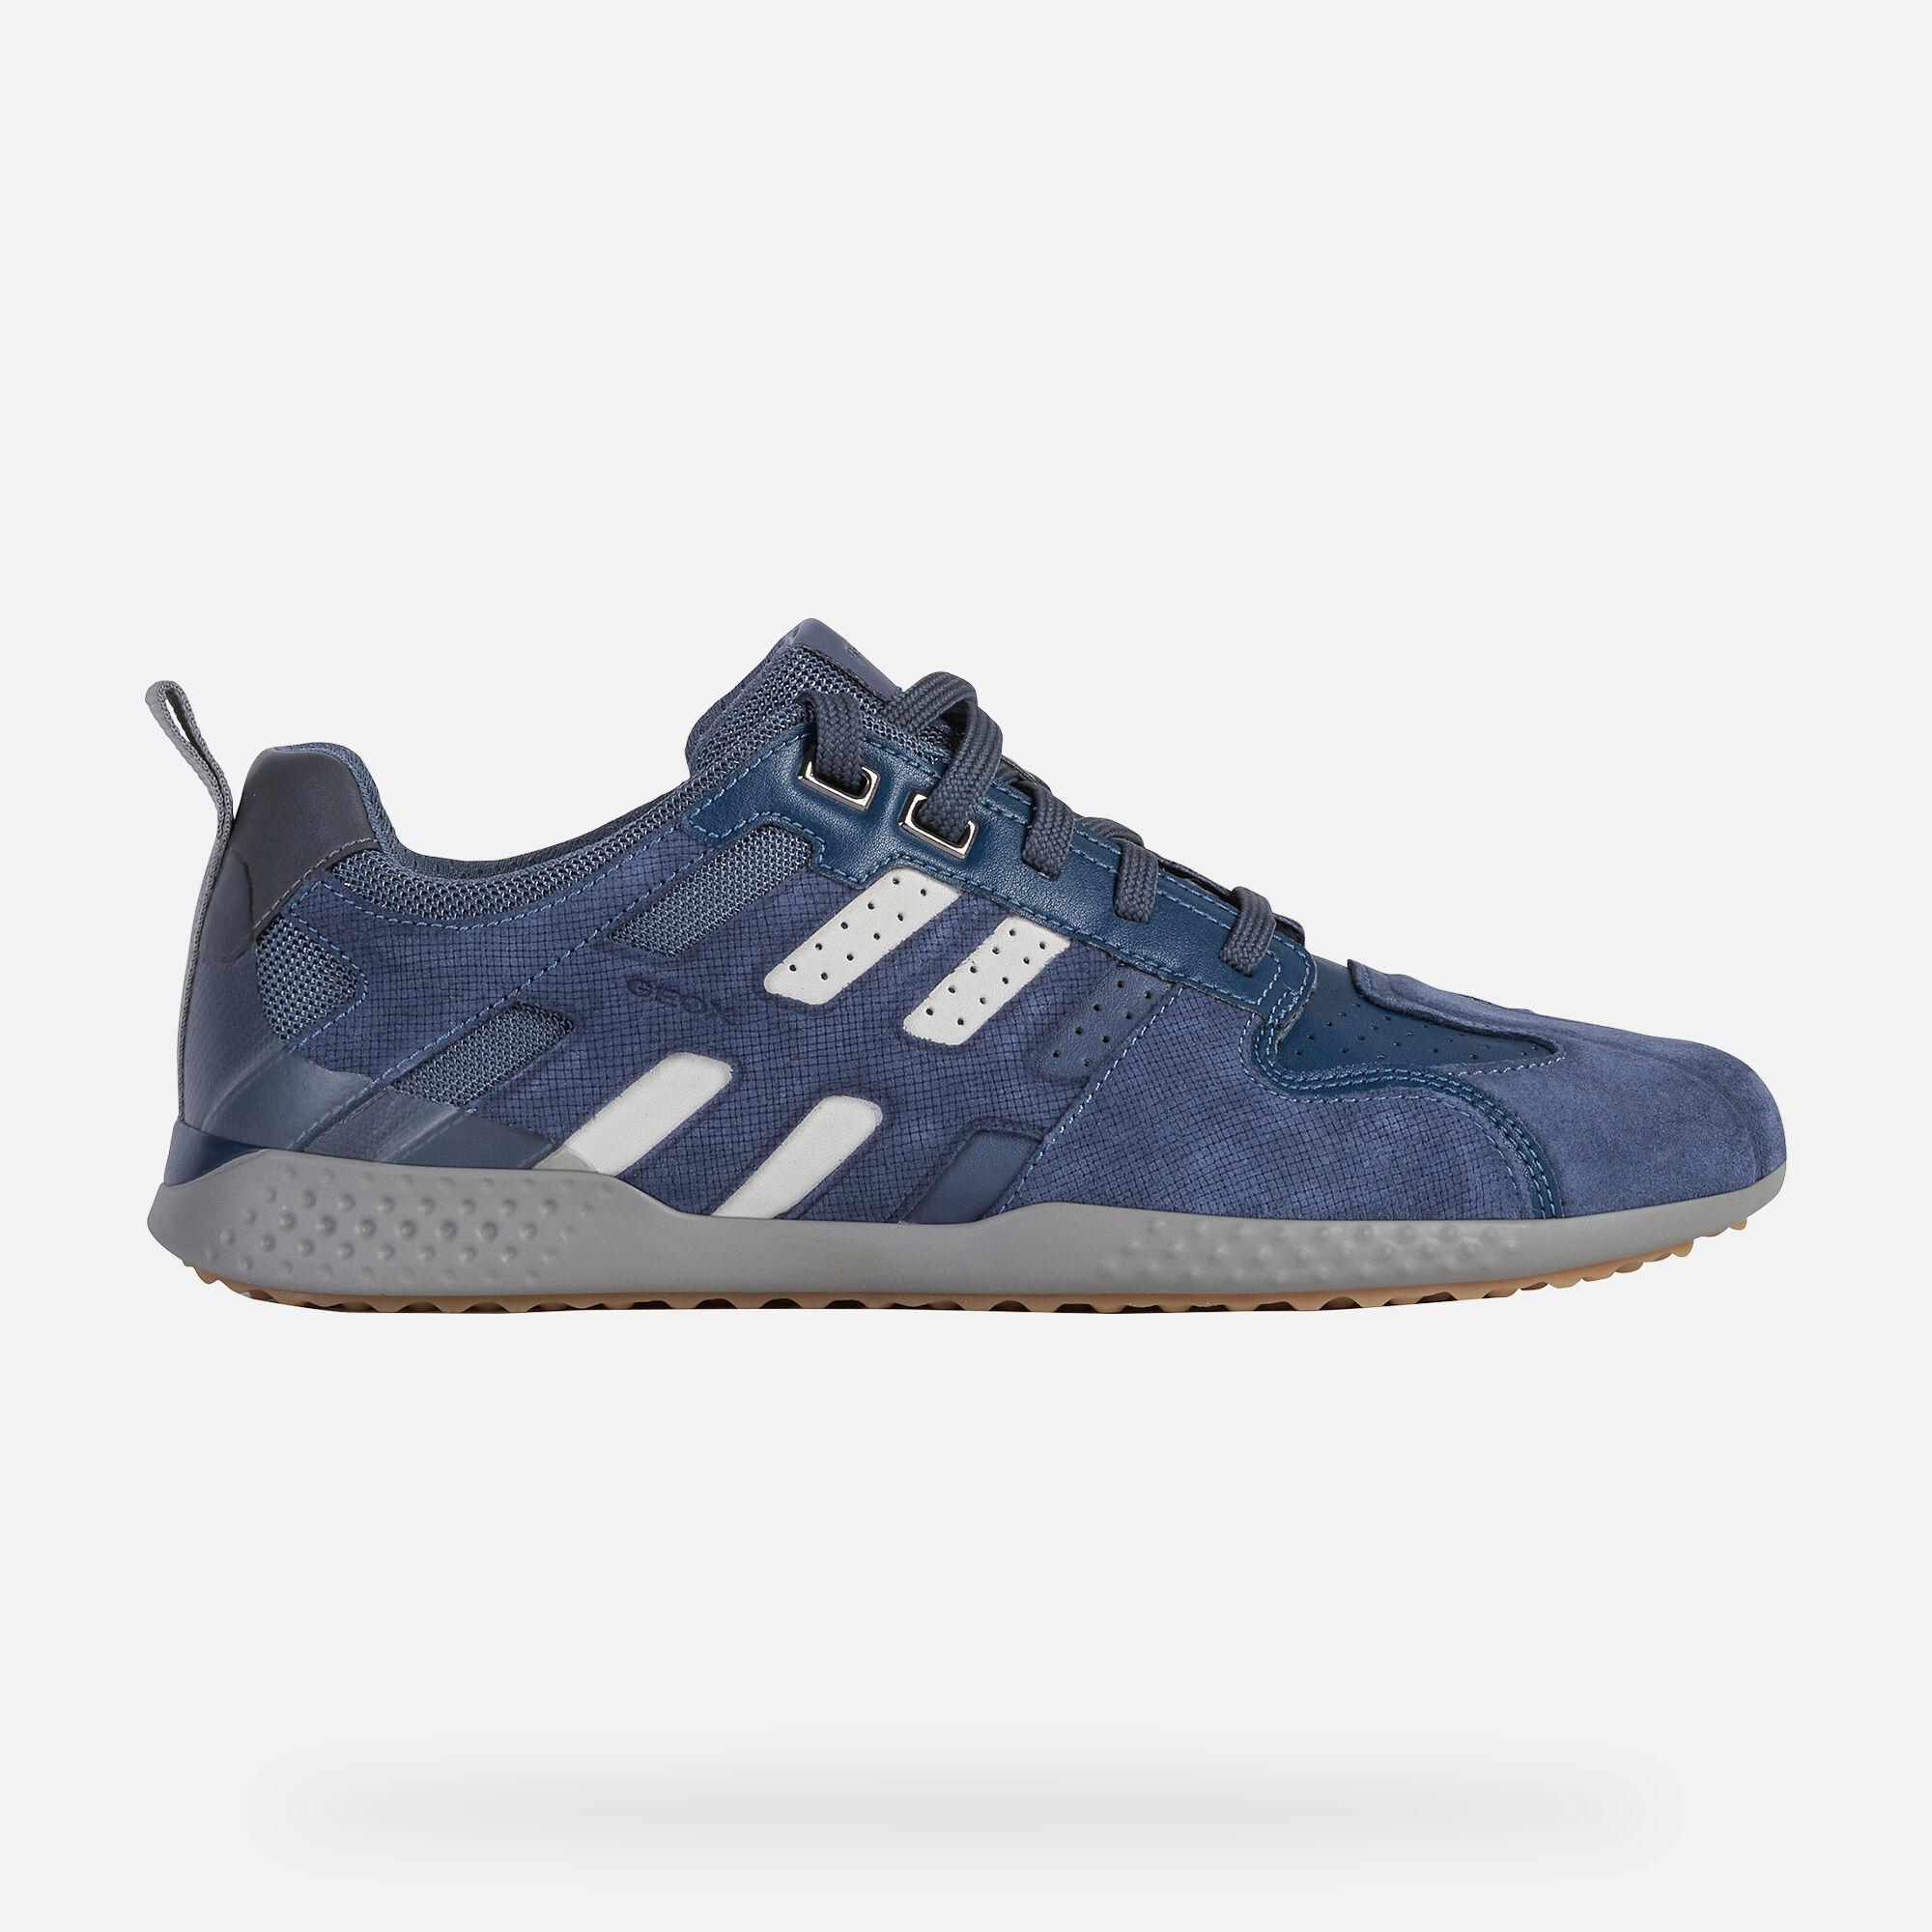 Geox SNAKE.2 Man: Blue Sneakers | Geox SS20